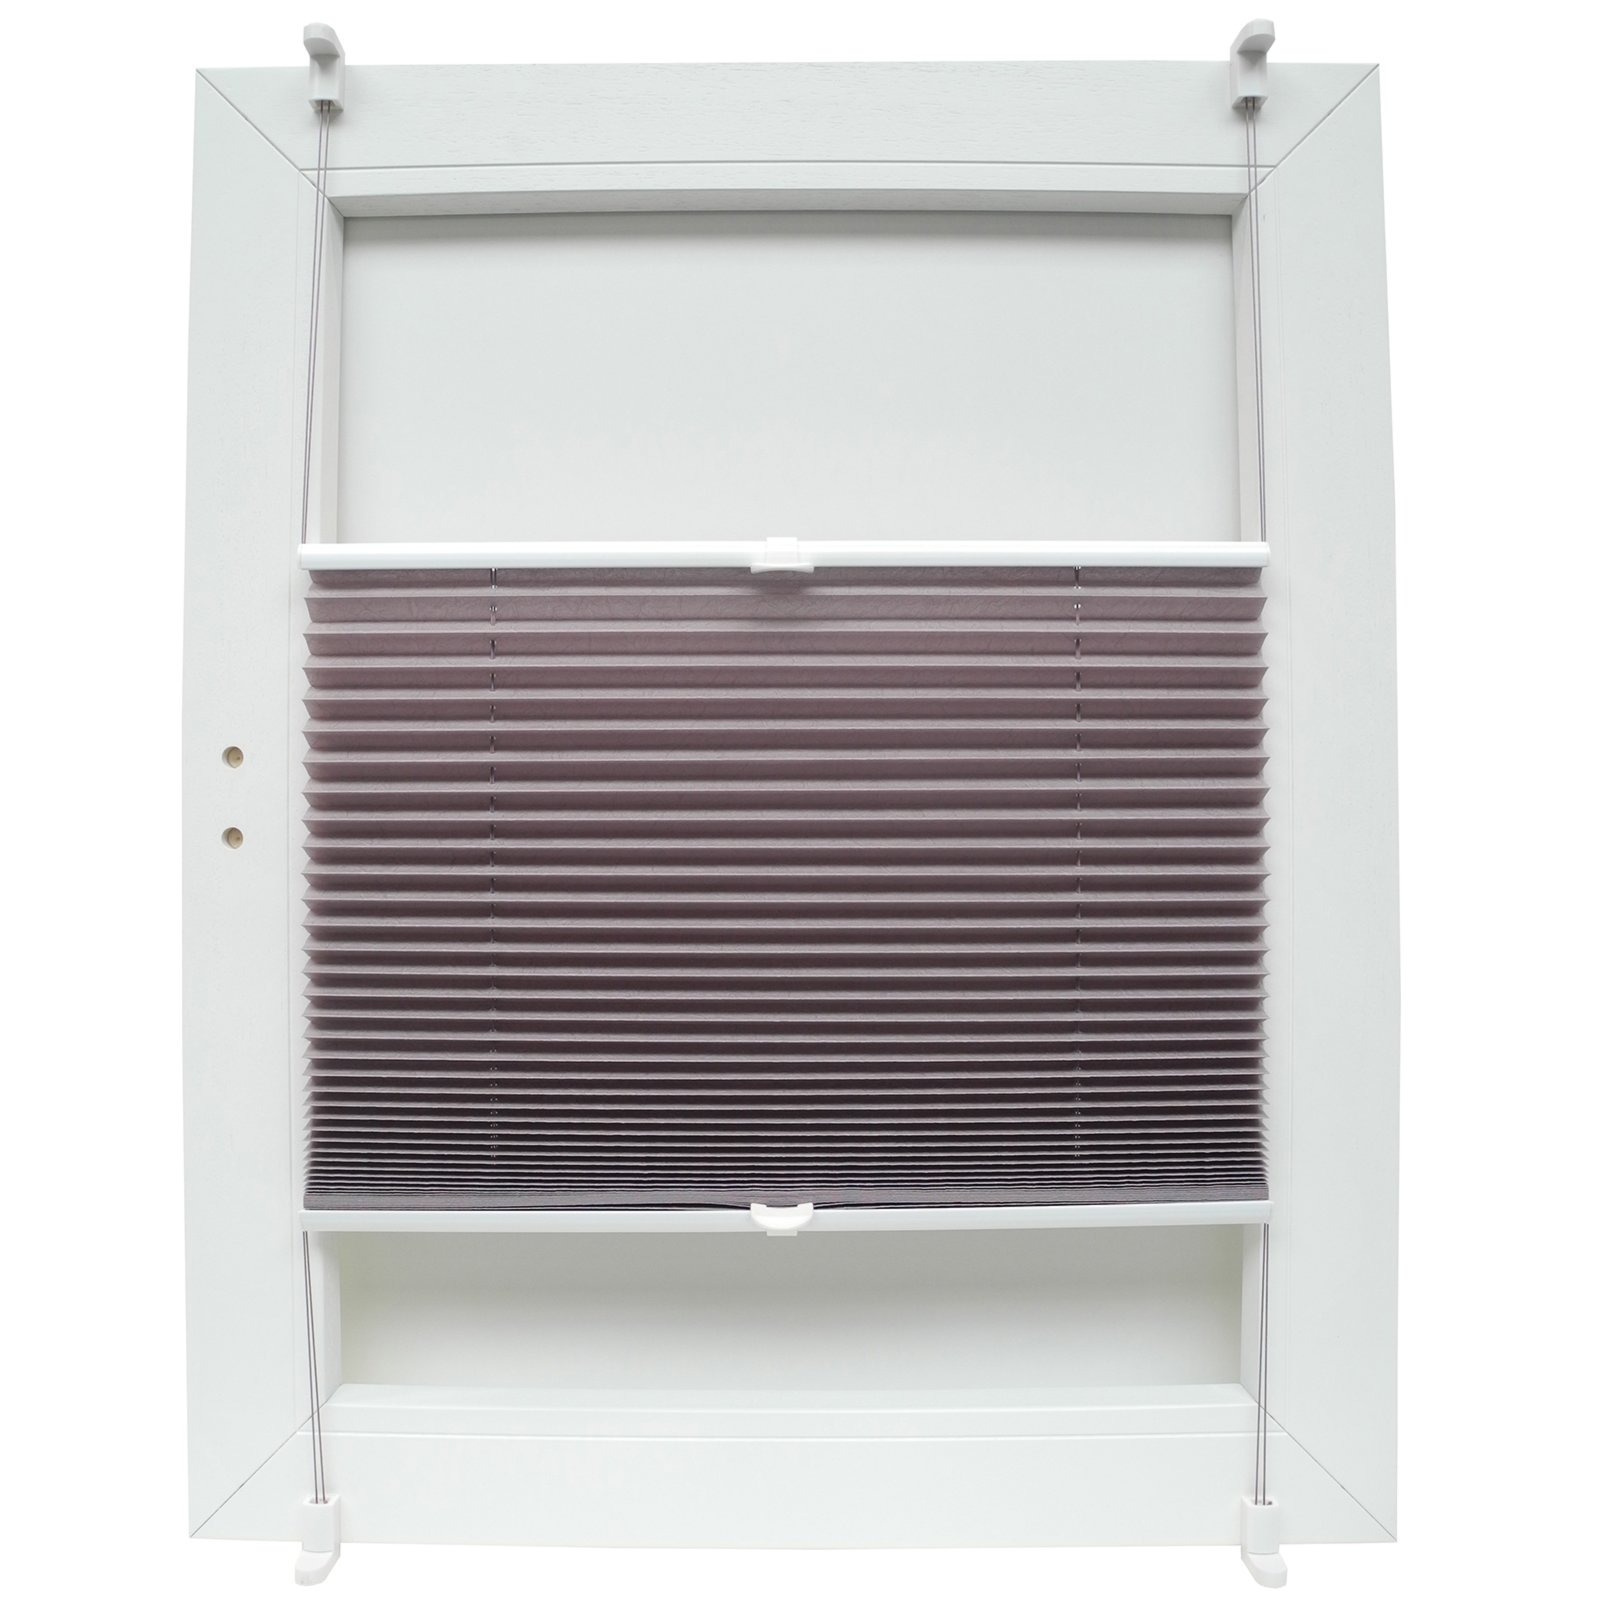 plissee sahara mauve 110x130 cm plissees rollos jalousien deko haushalt roller. Black Bedroom Furniture Sets. Home Design Ideas